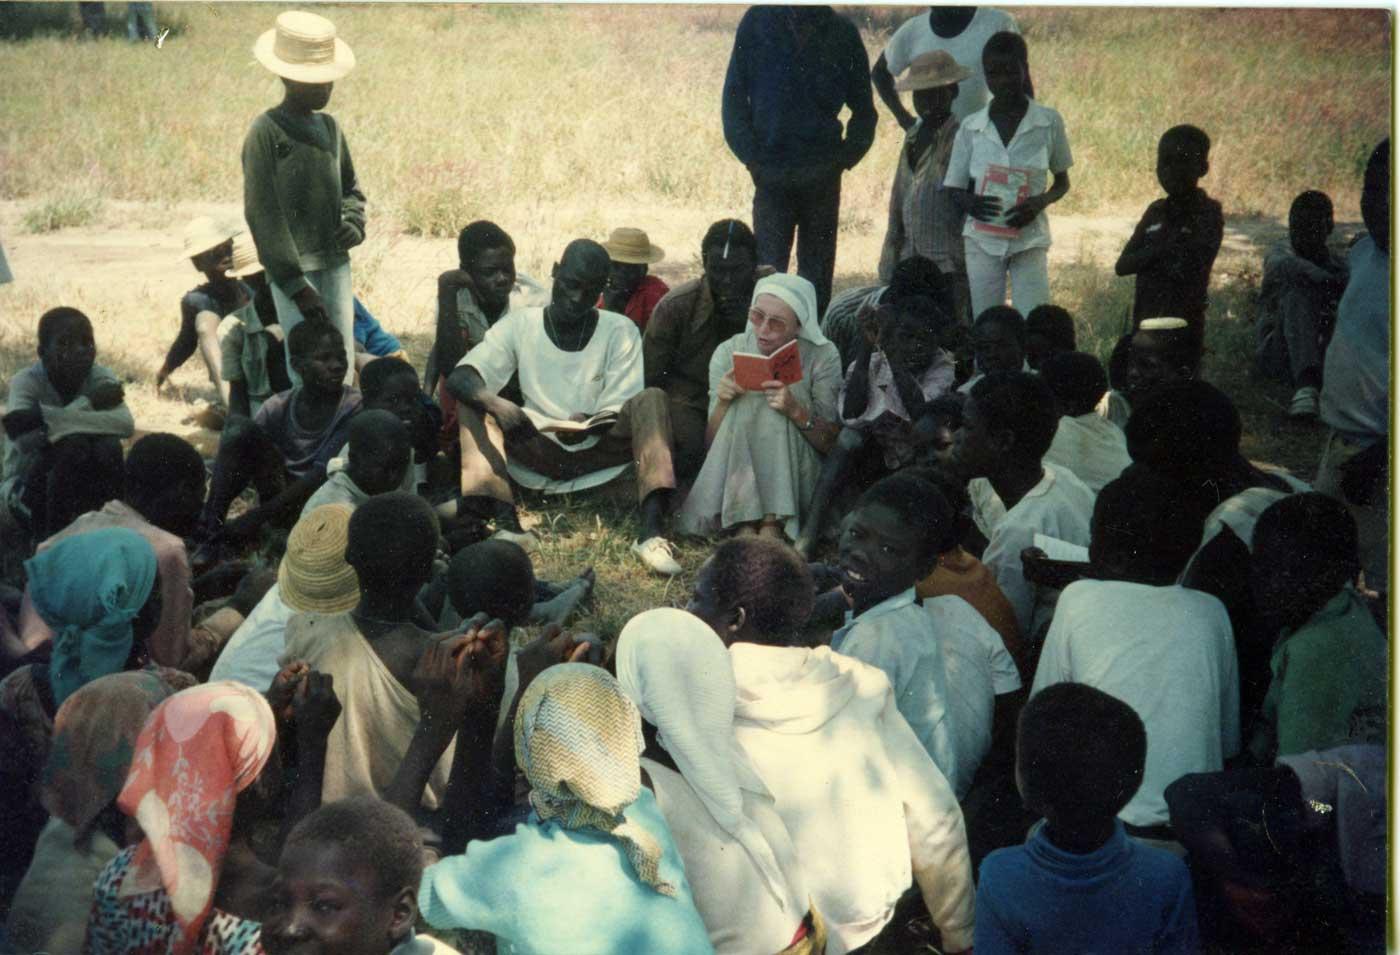 1986, Padermé – Camarões